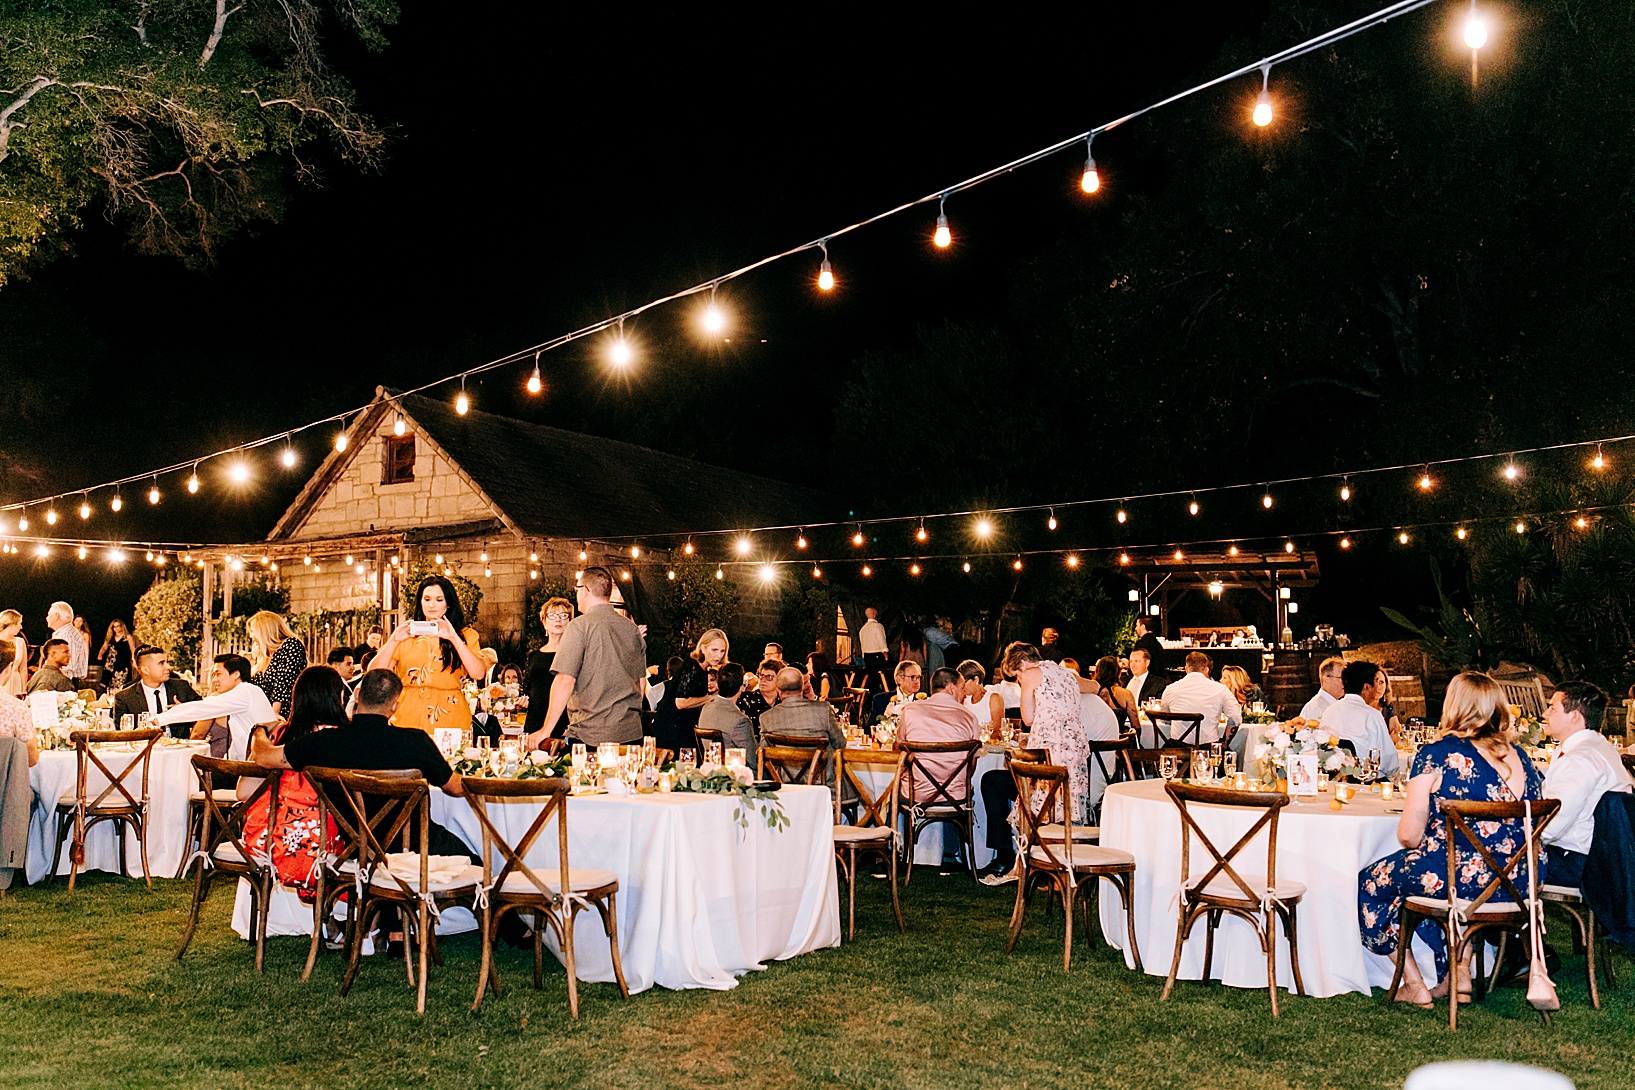 Reception for Temecula wedding at Temecula Creek Inn